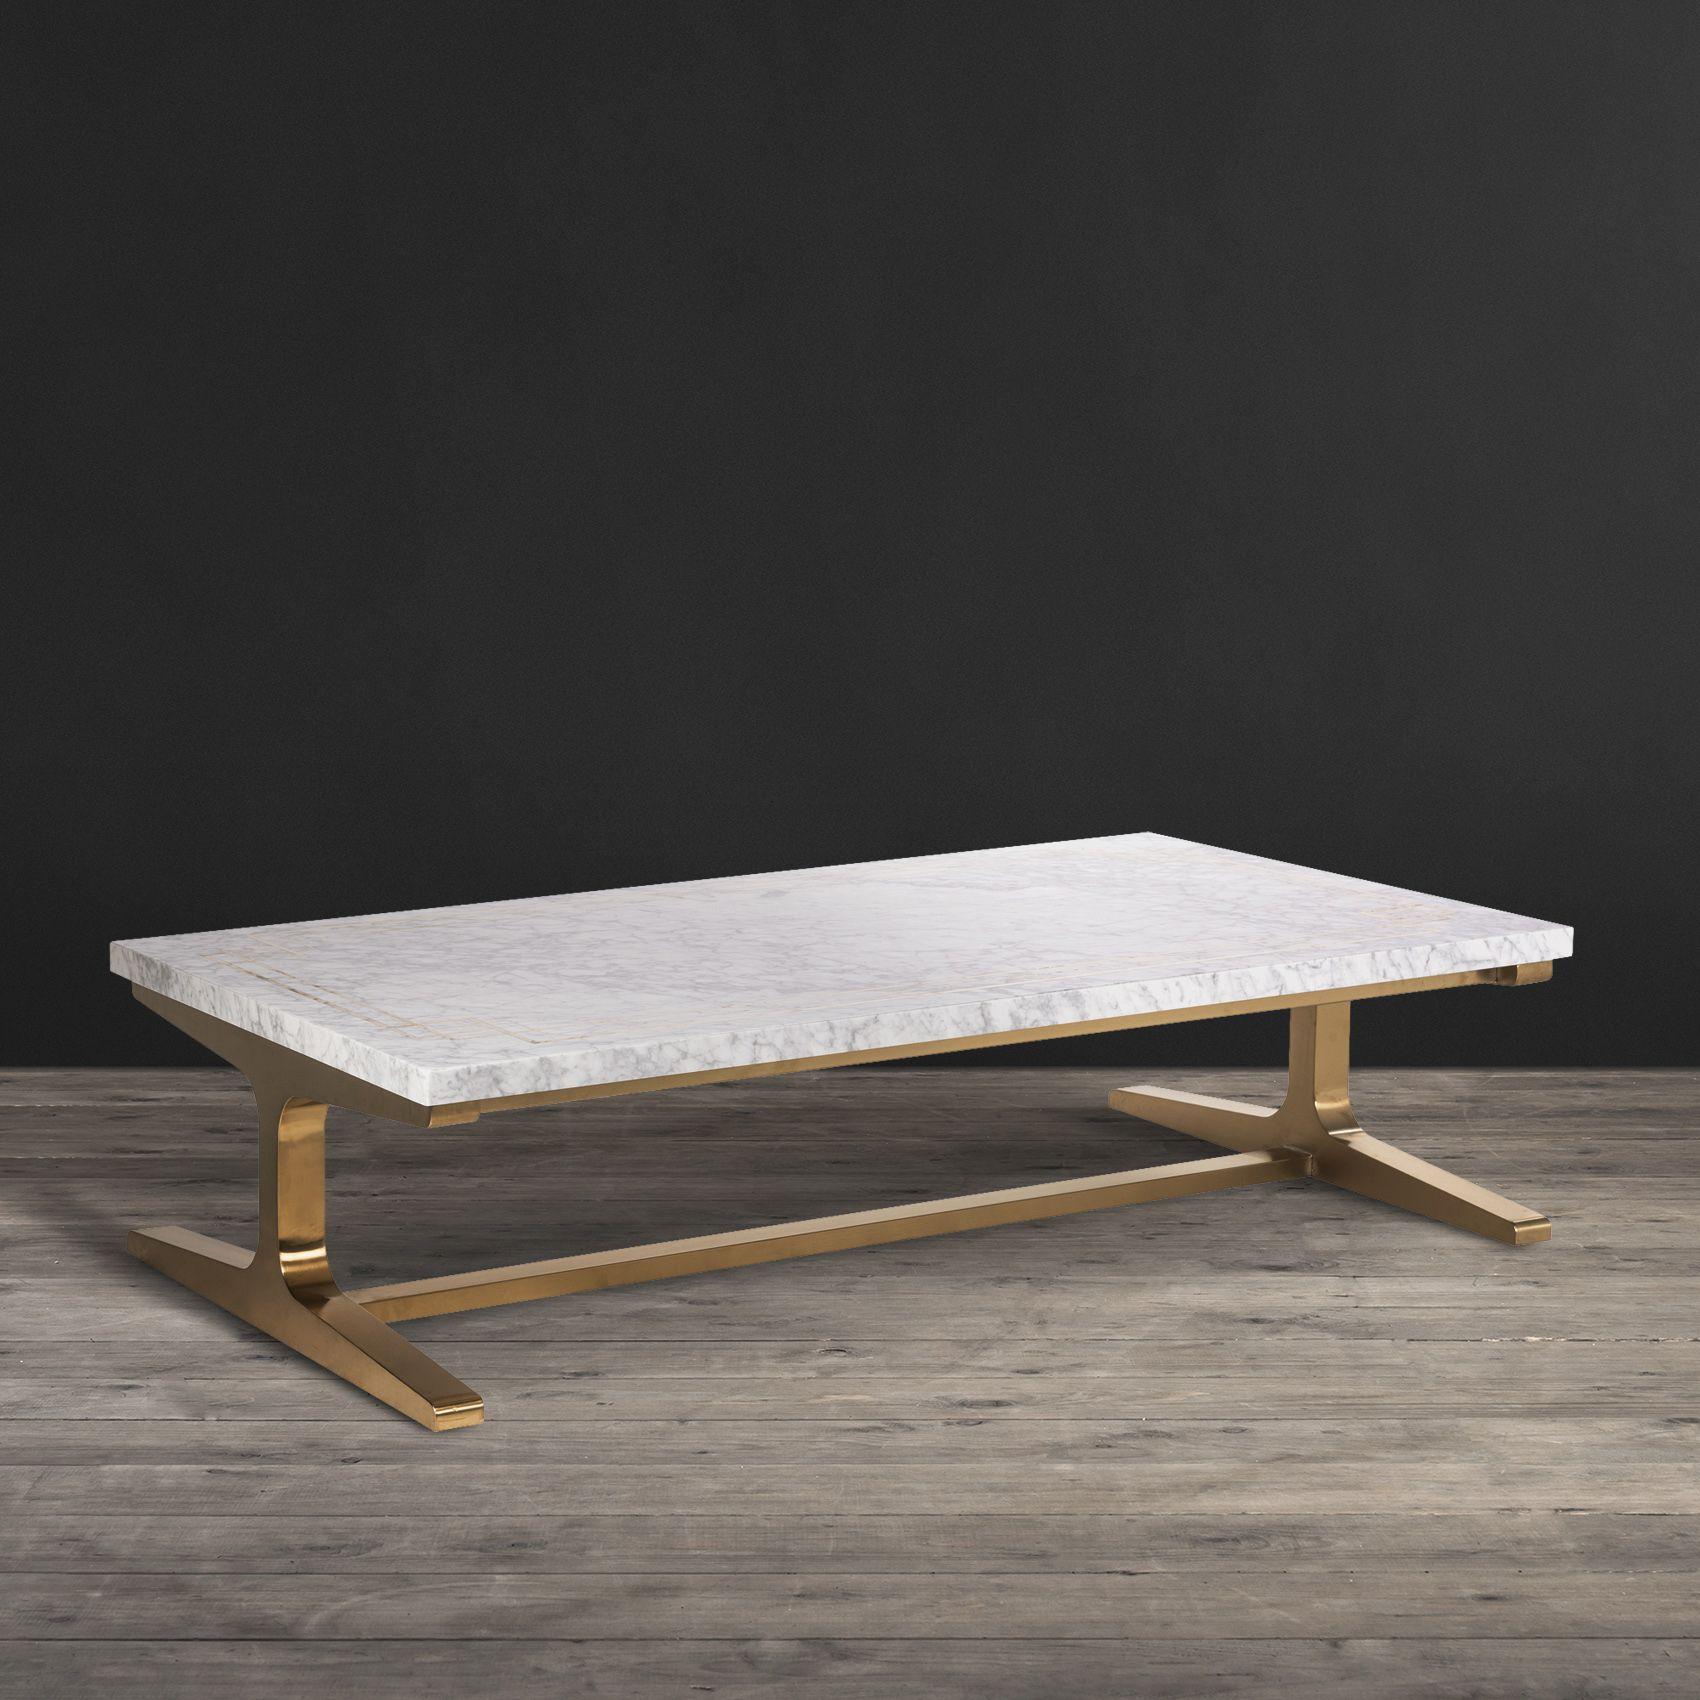 Timothy Oulton Titus Coffee Table Stocktons Designer Furniture Coffee Table Coffee Table Furniture Leather Furniture [ 1700 x 1700 Pixel ]